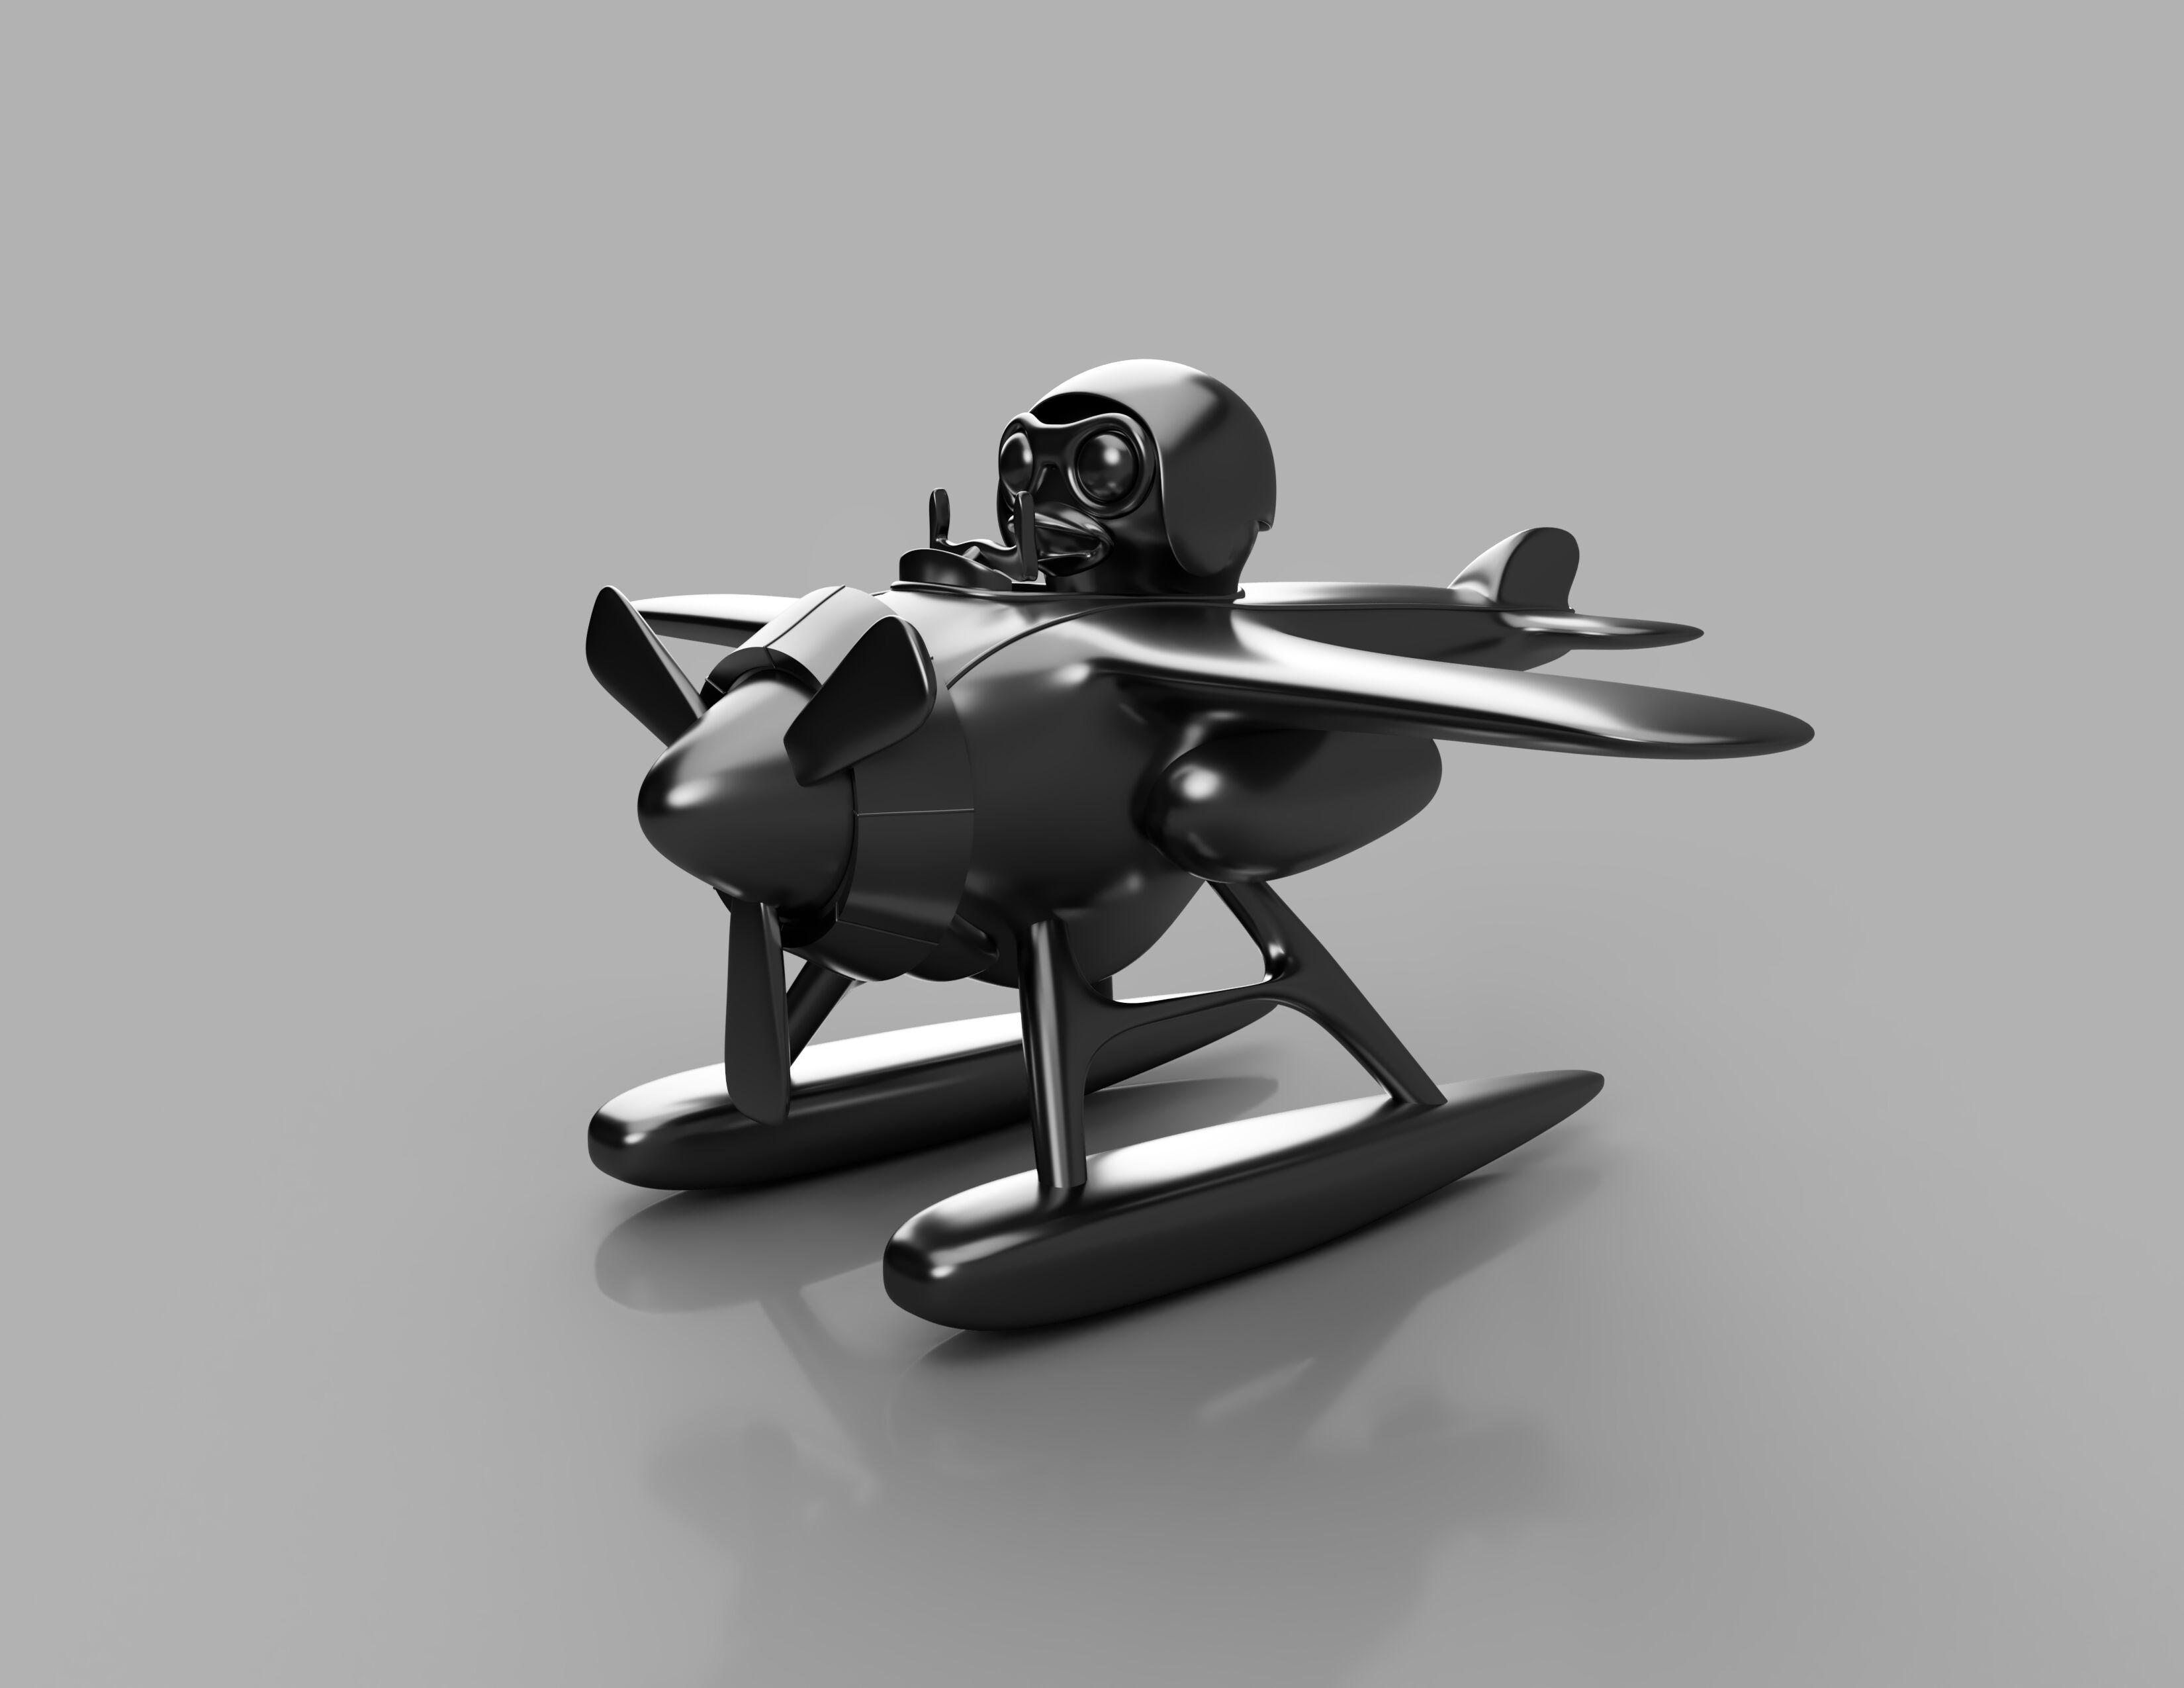 Avion-de-juguete--render-2020-jun-29-09-01-01pm-000-customizedview5002185427-png-3500-3500